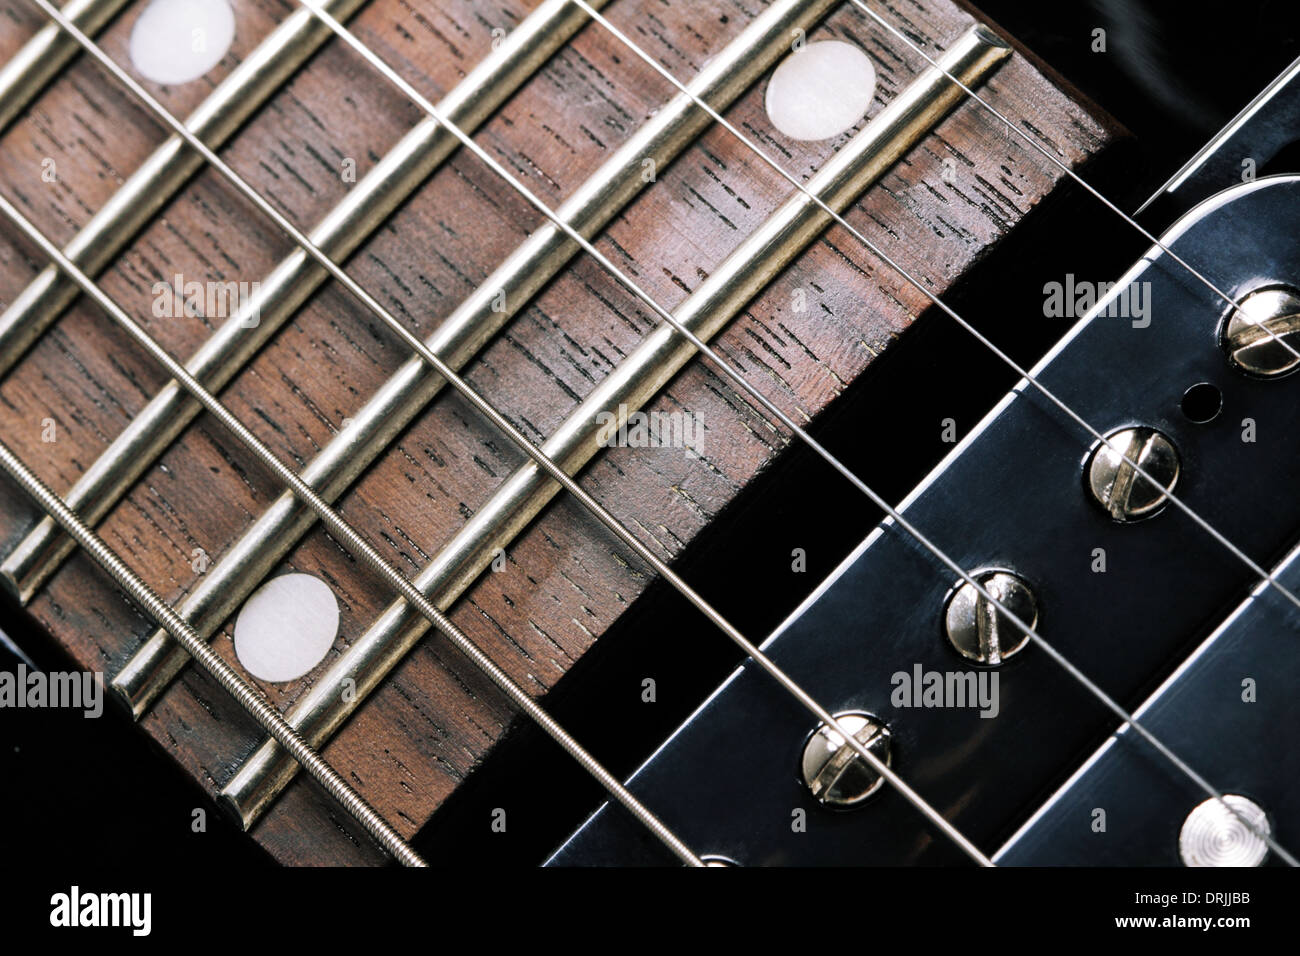 guitar fretboard stock photos guitar fretboard stock images alamy. Black Bedroom Furniture Sets. Home Design Ideas